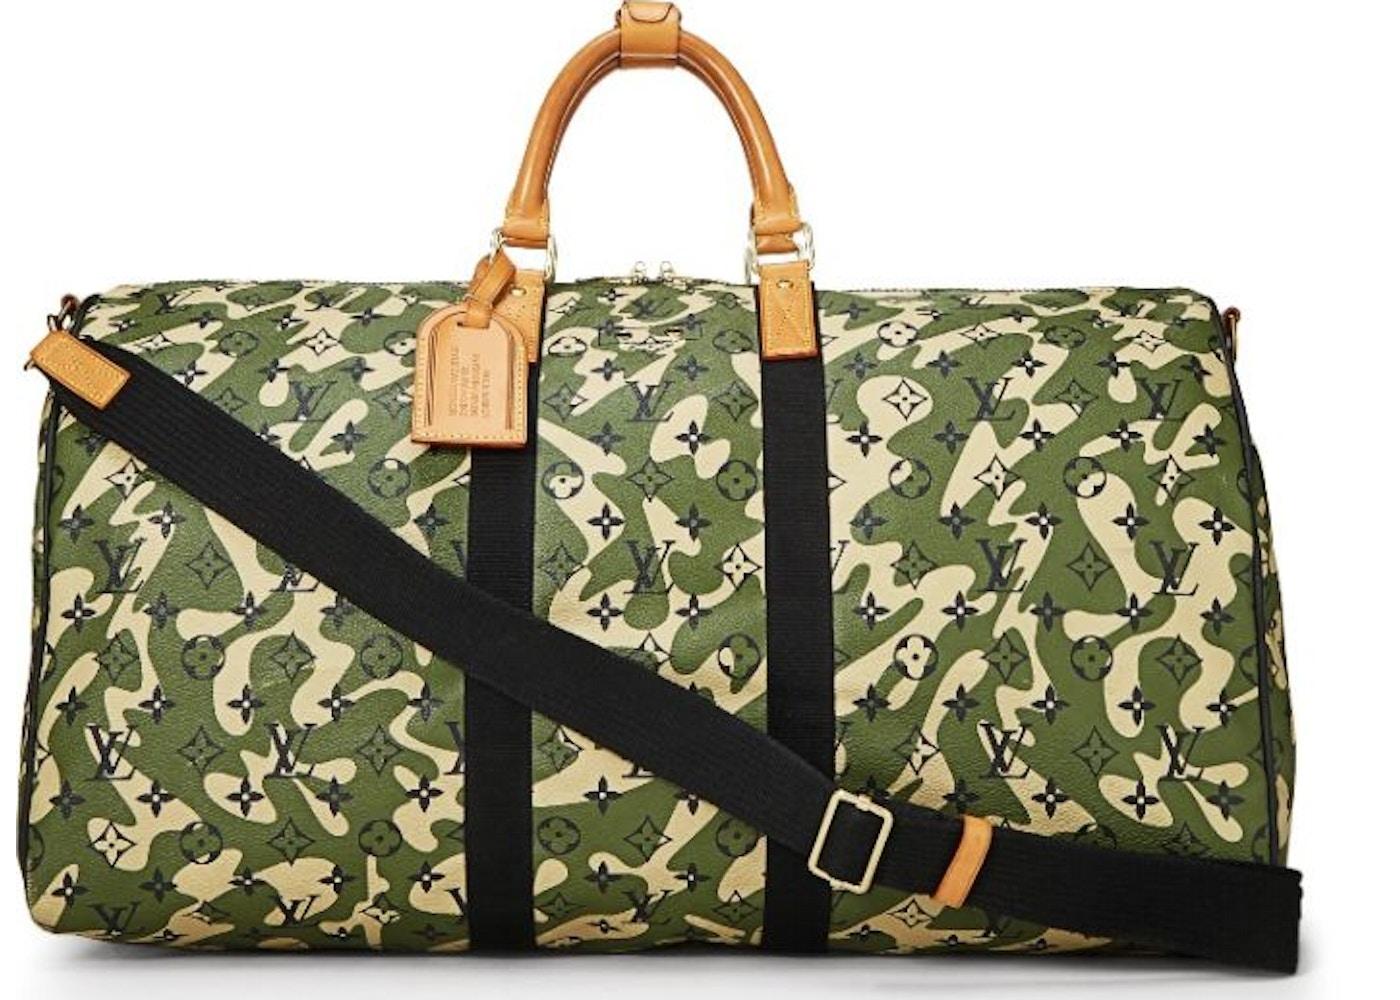 954a7599bb2f Louis Vuitton Keepall Bandouliere Monogramouflage 55 Green Beige Black.  Monogramouflage 55 Green Beige Black